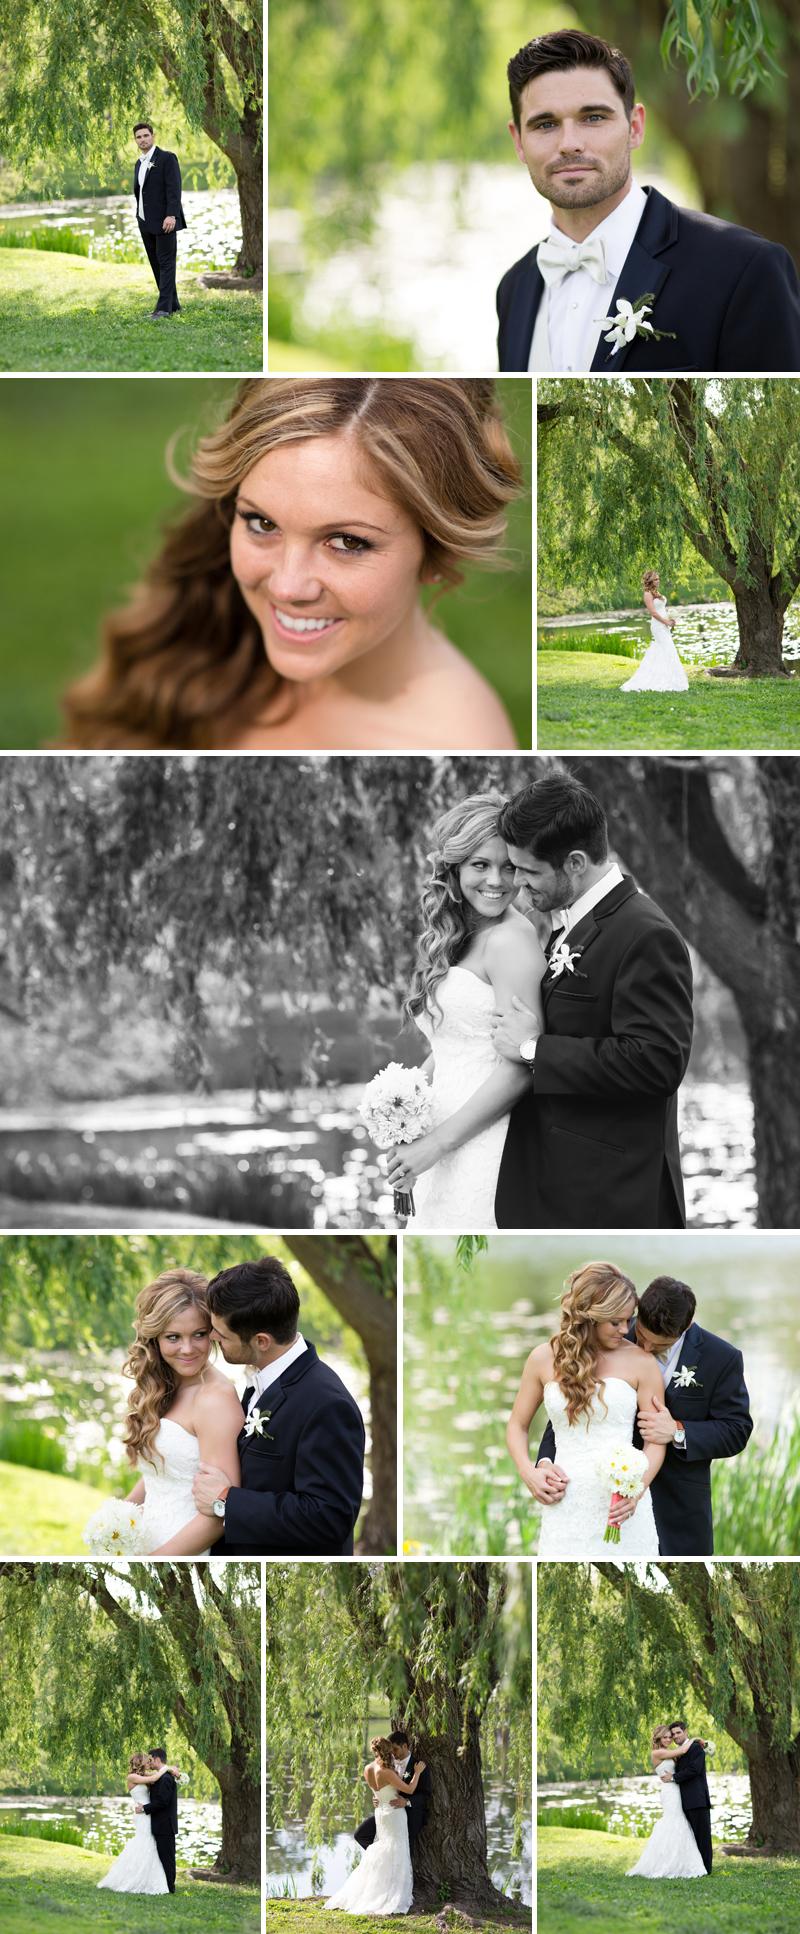 Lawrence Kansas Alvamar Country Club Potter Lake wedding photo